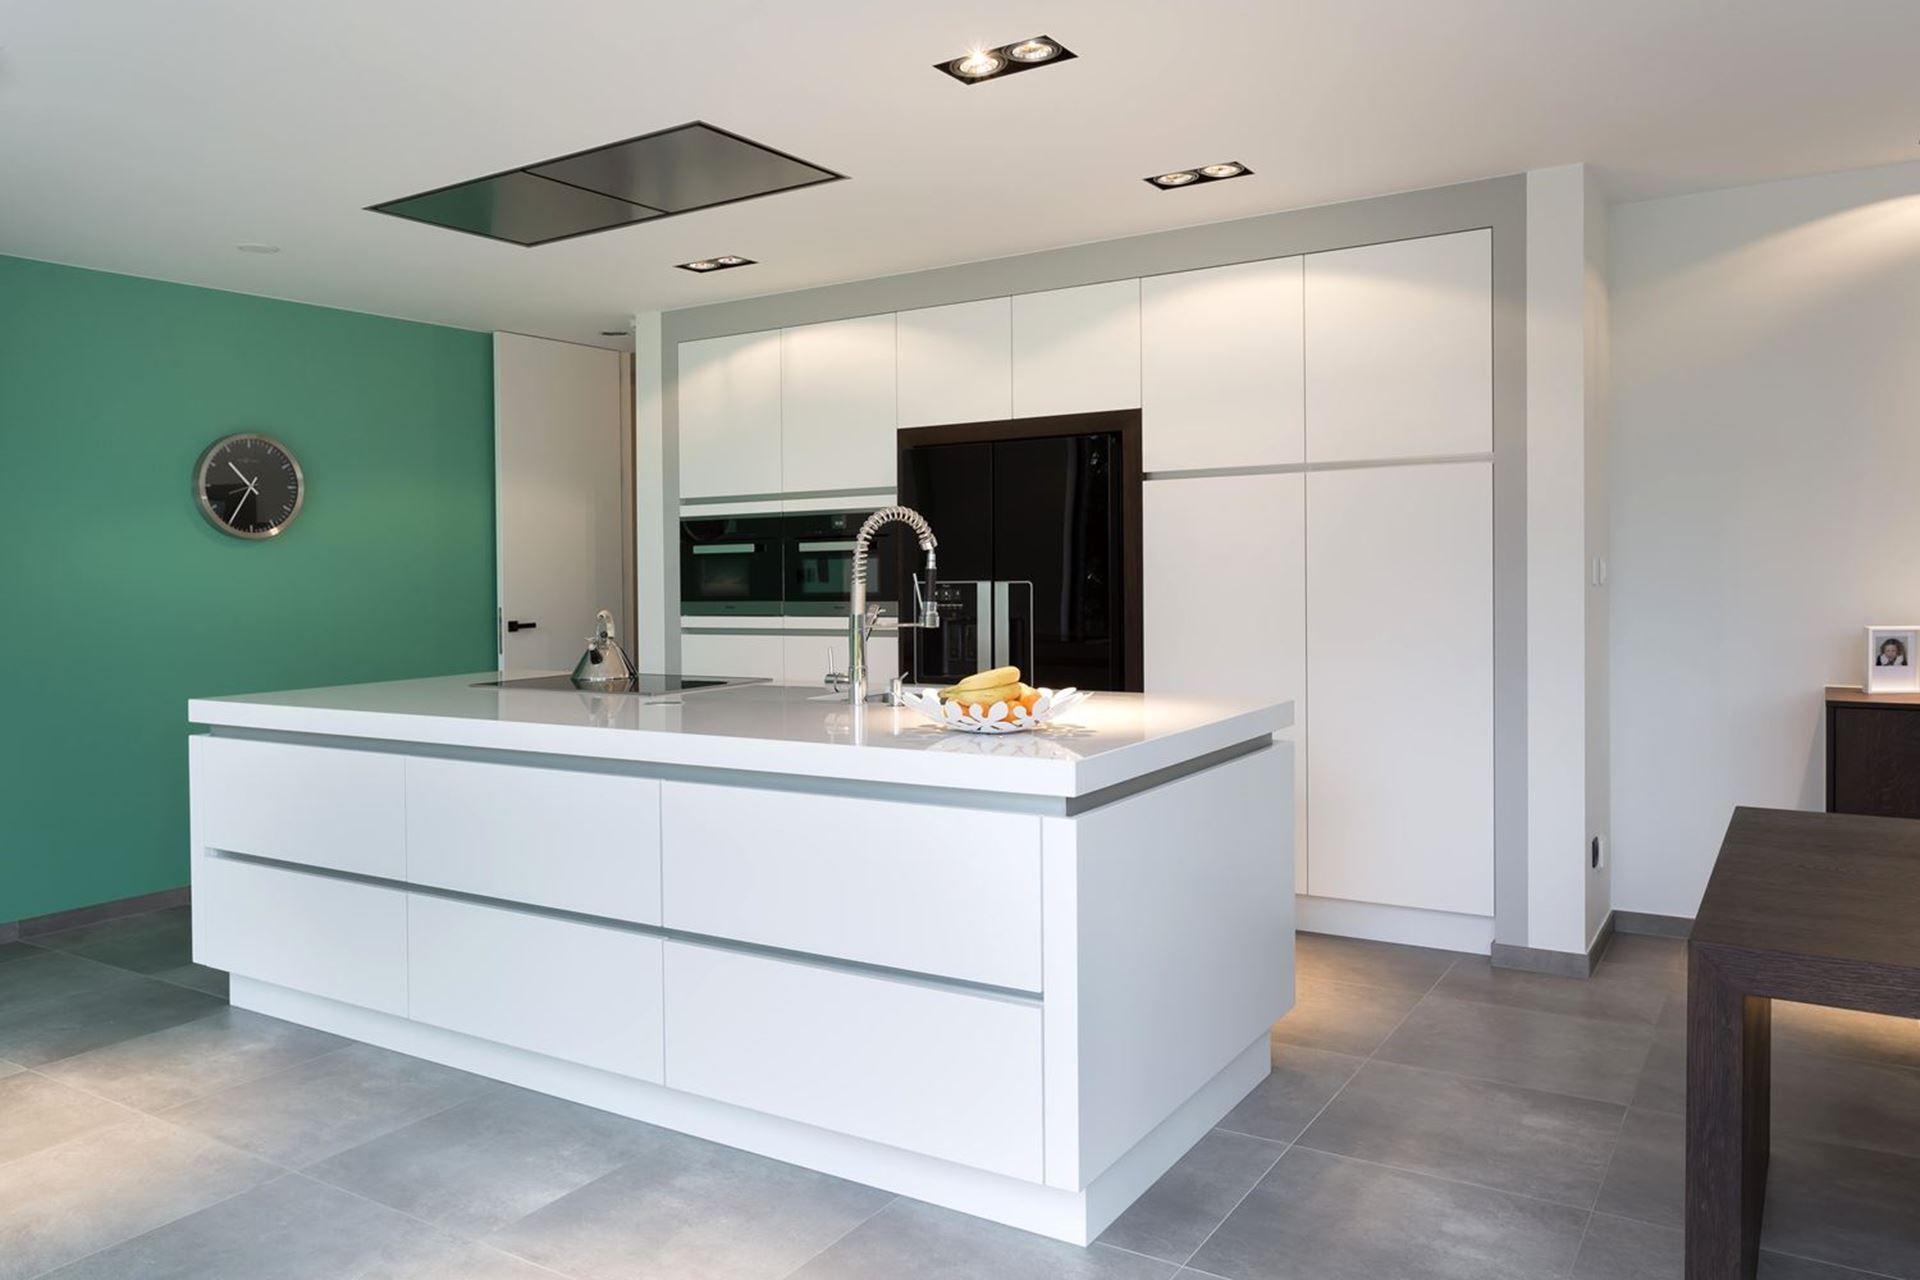 Witte keuken amerikaanse koelkast google zoeken keuken pinterest search - Keuken witte tafel ...